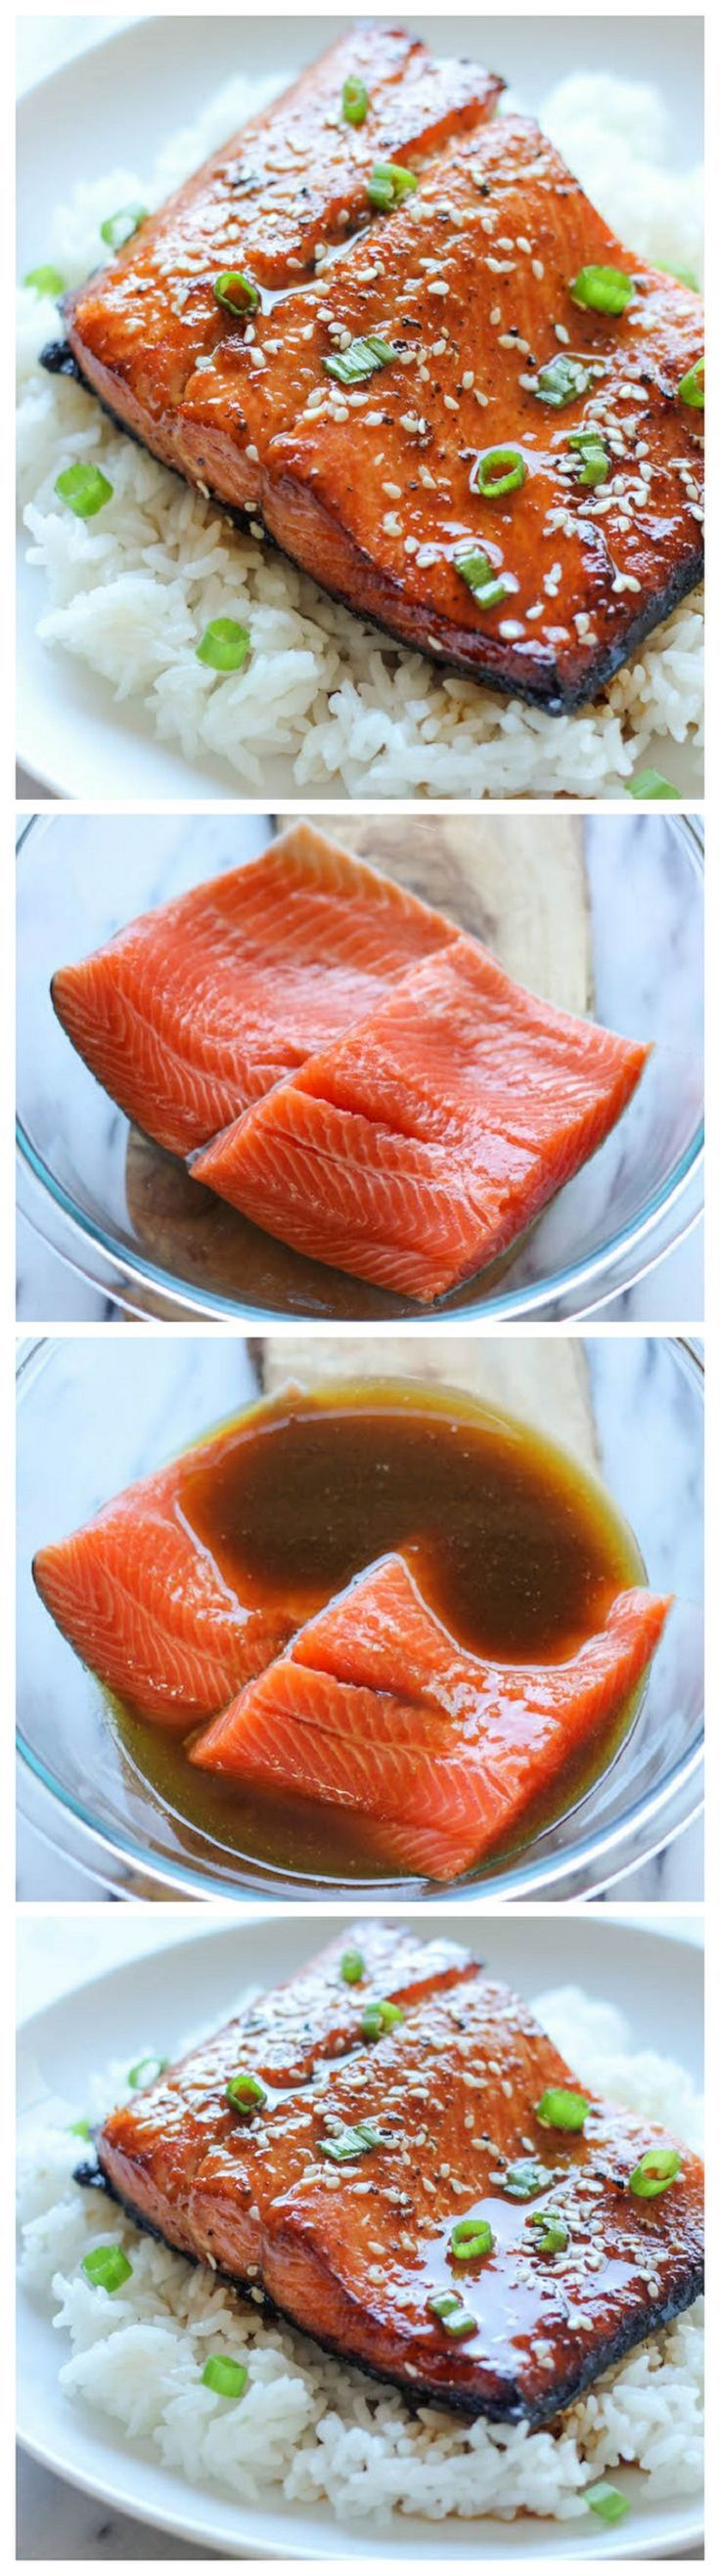 15 Most Popular Salmon Recipes – GleamItUp